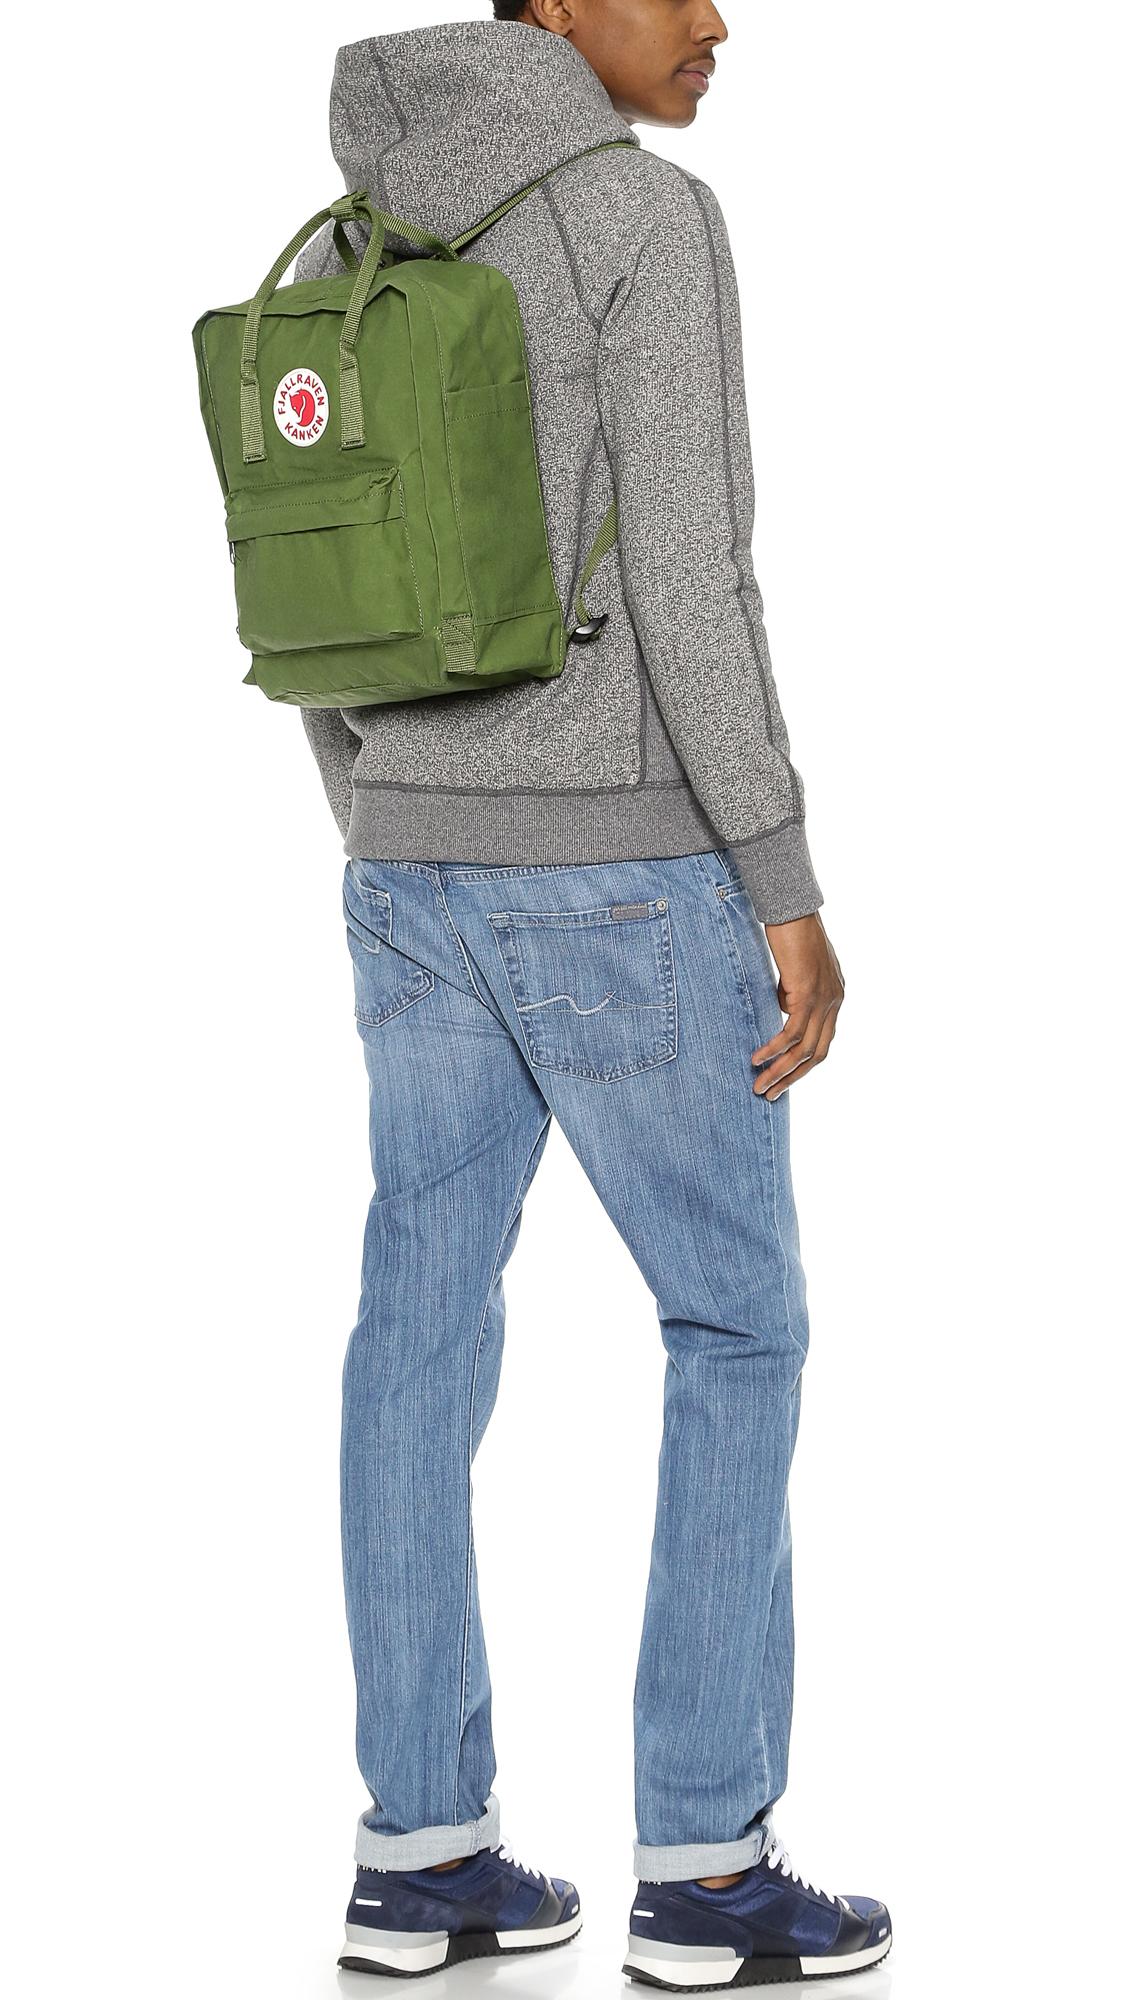 Fjallraven Kanken Backpack in Green for Men - Lyst fa4dccbb9efa9